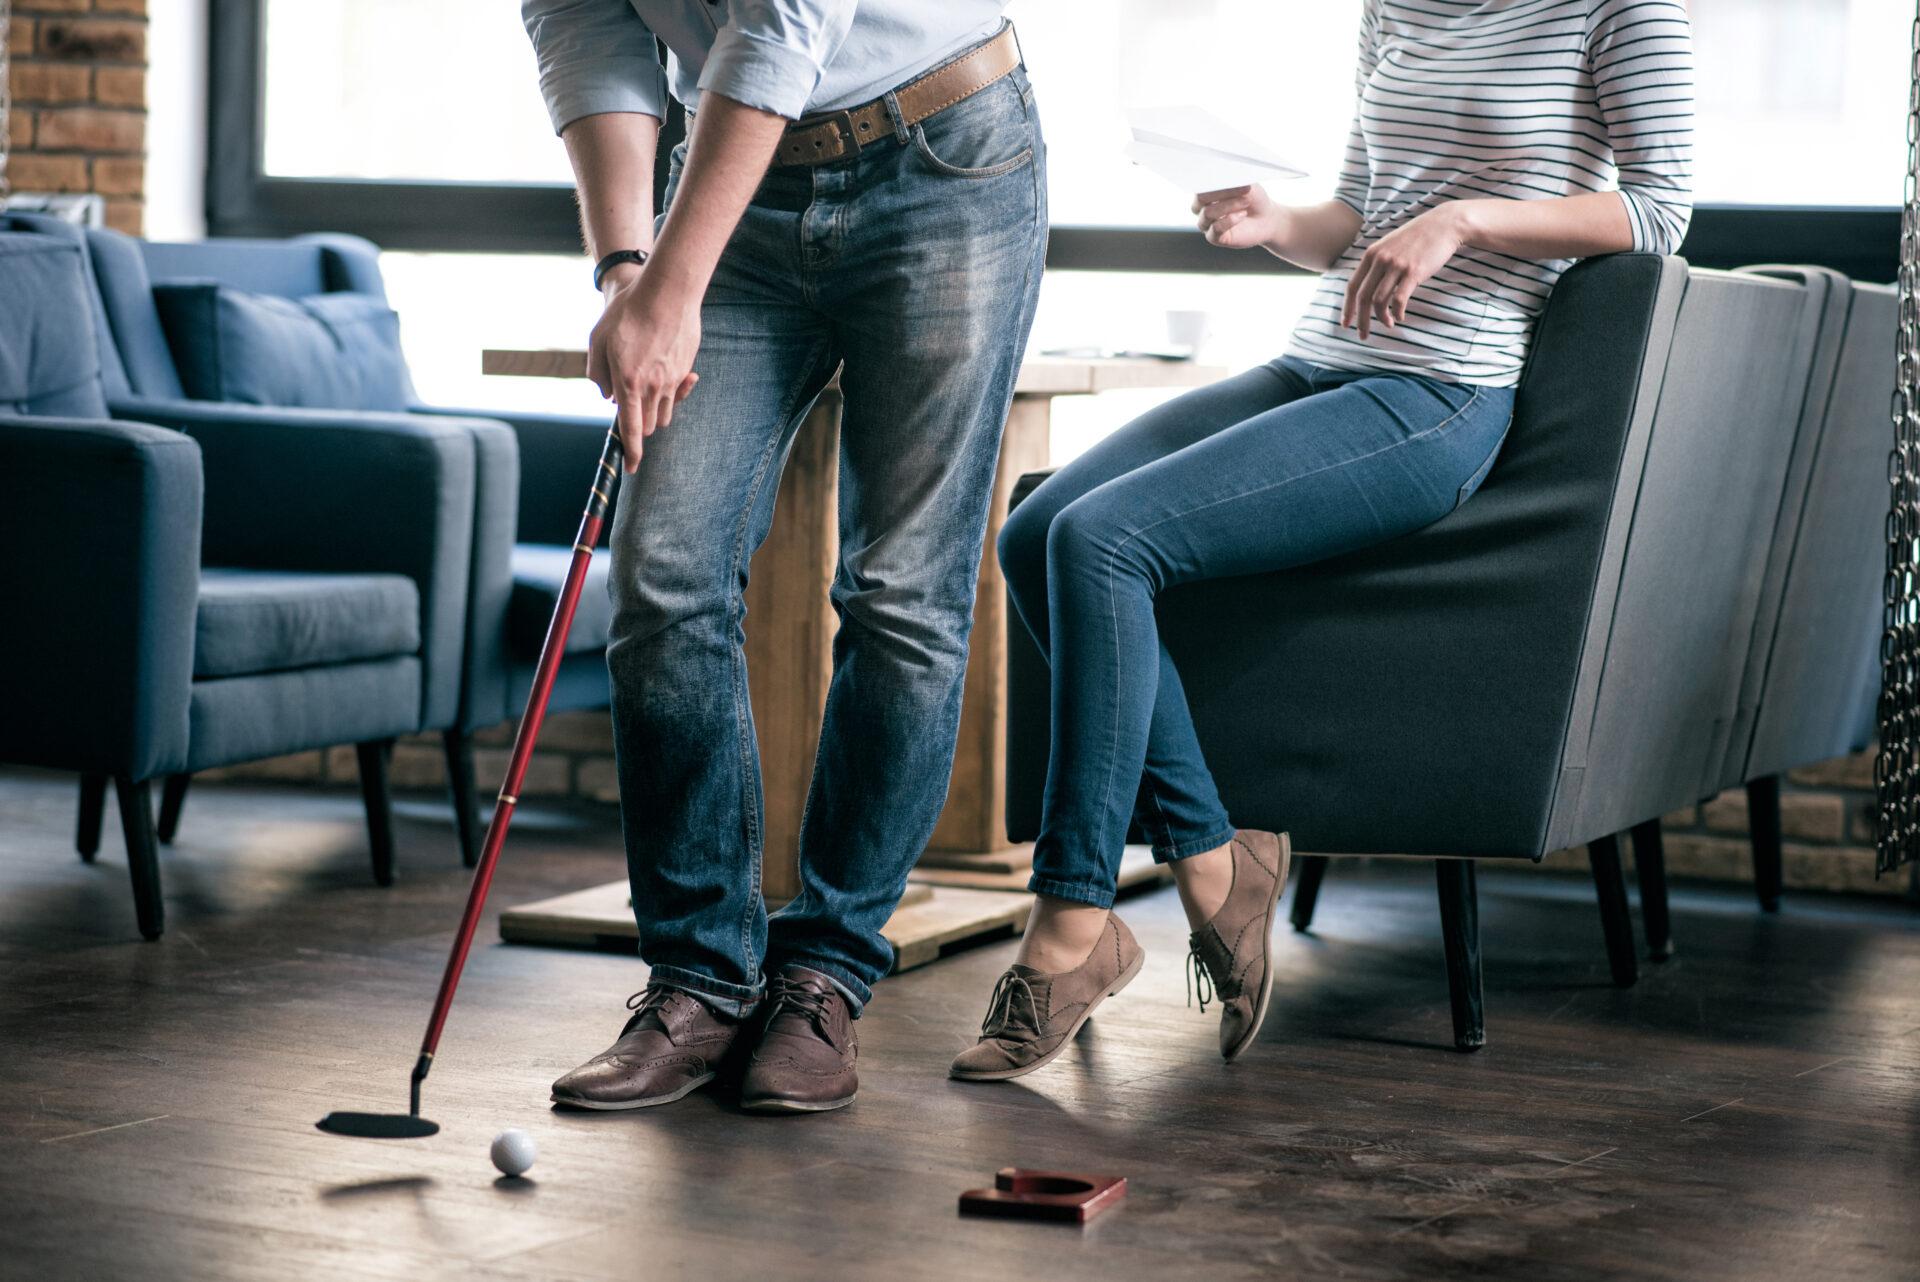 Golf-Related Activities